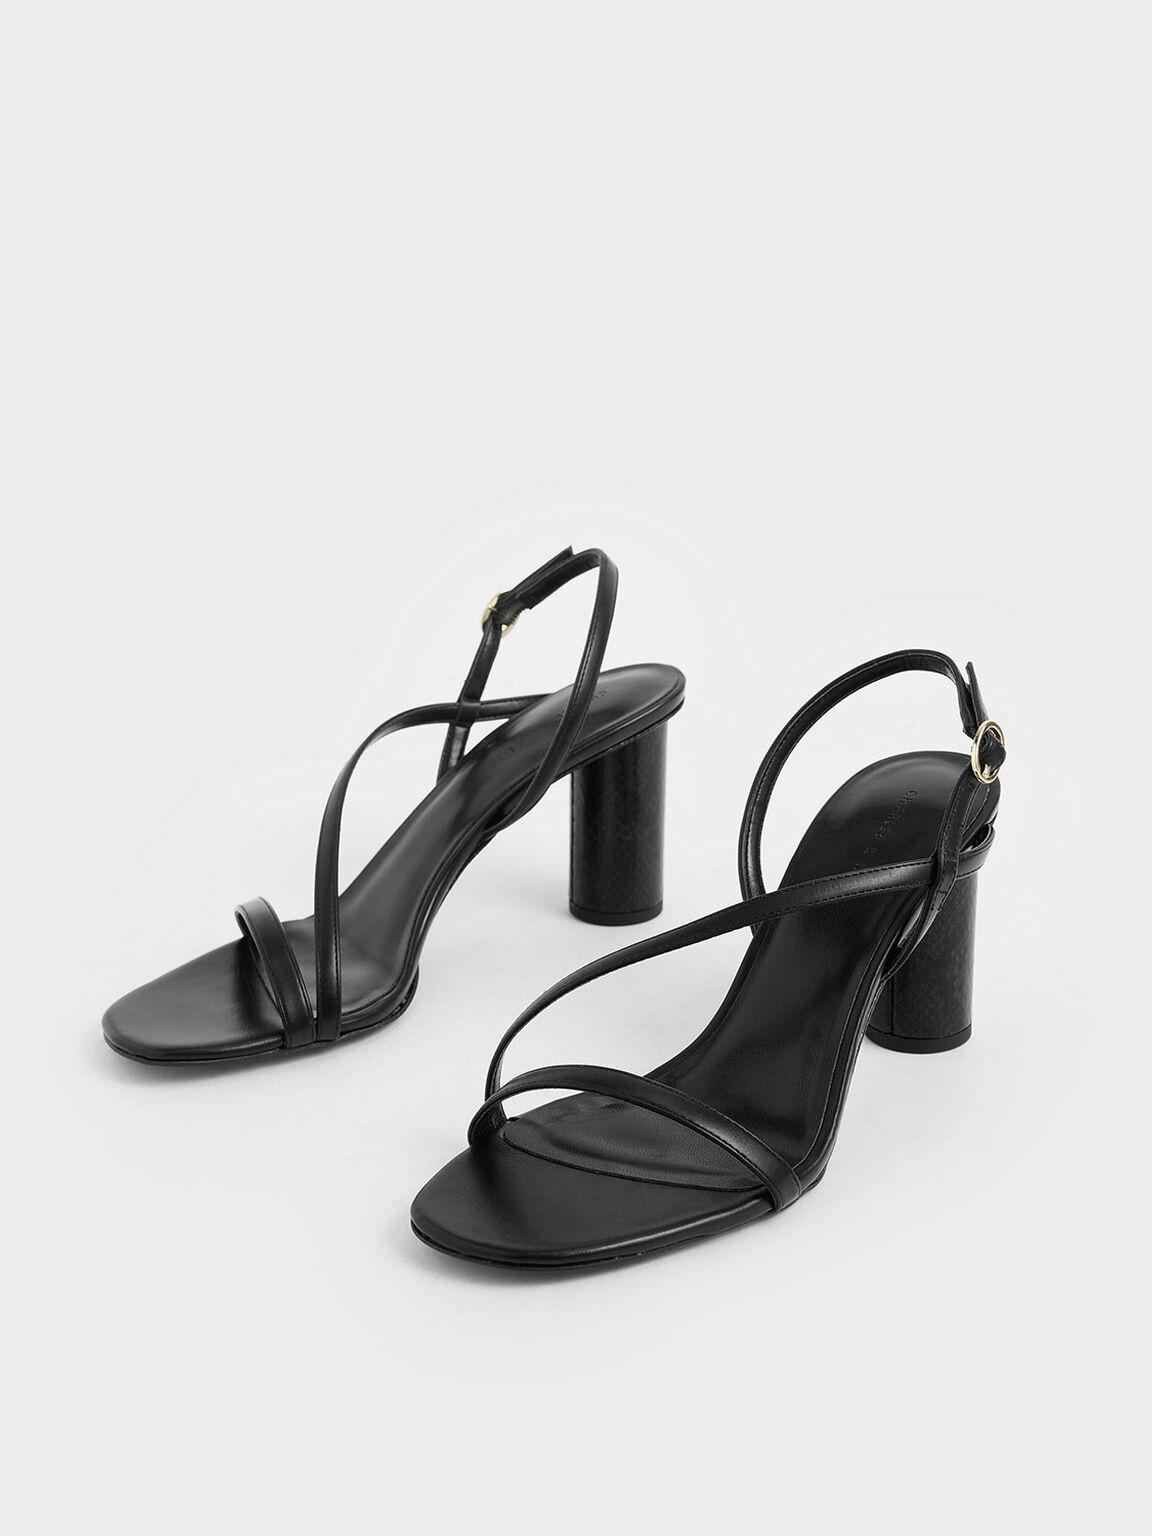 Asymmetric Strap Cylindrical Heel Sandals, Black, hi-res